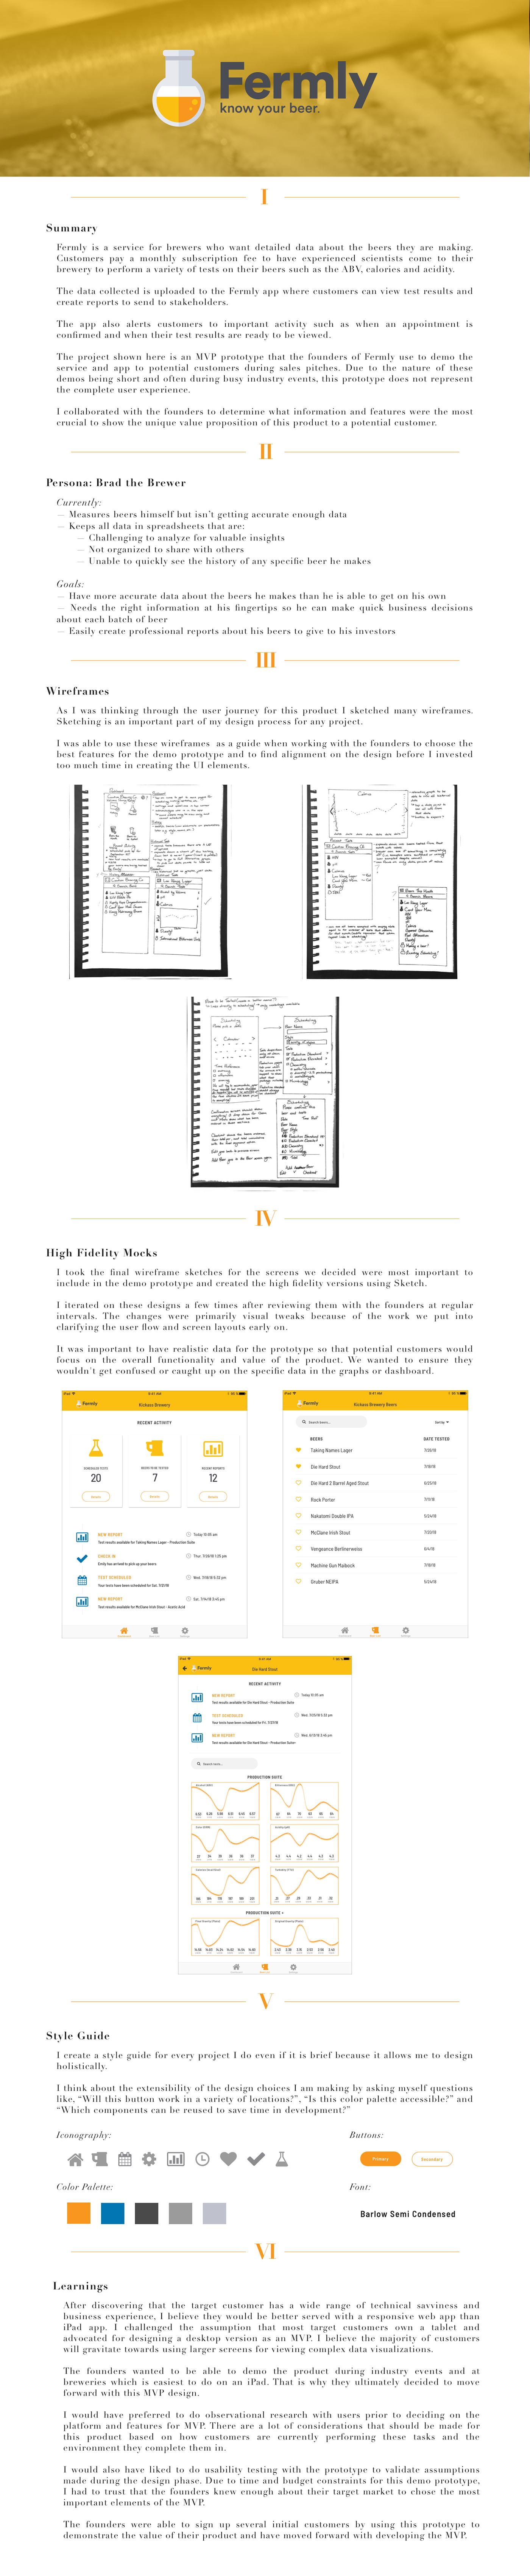 data visualization iPad App